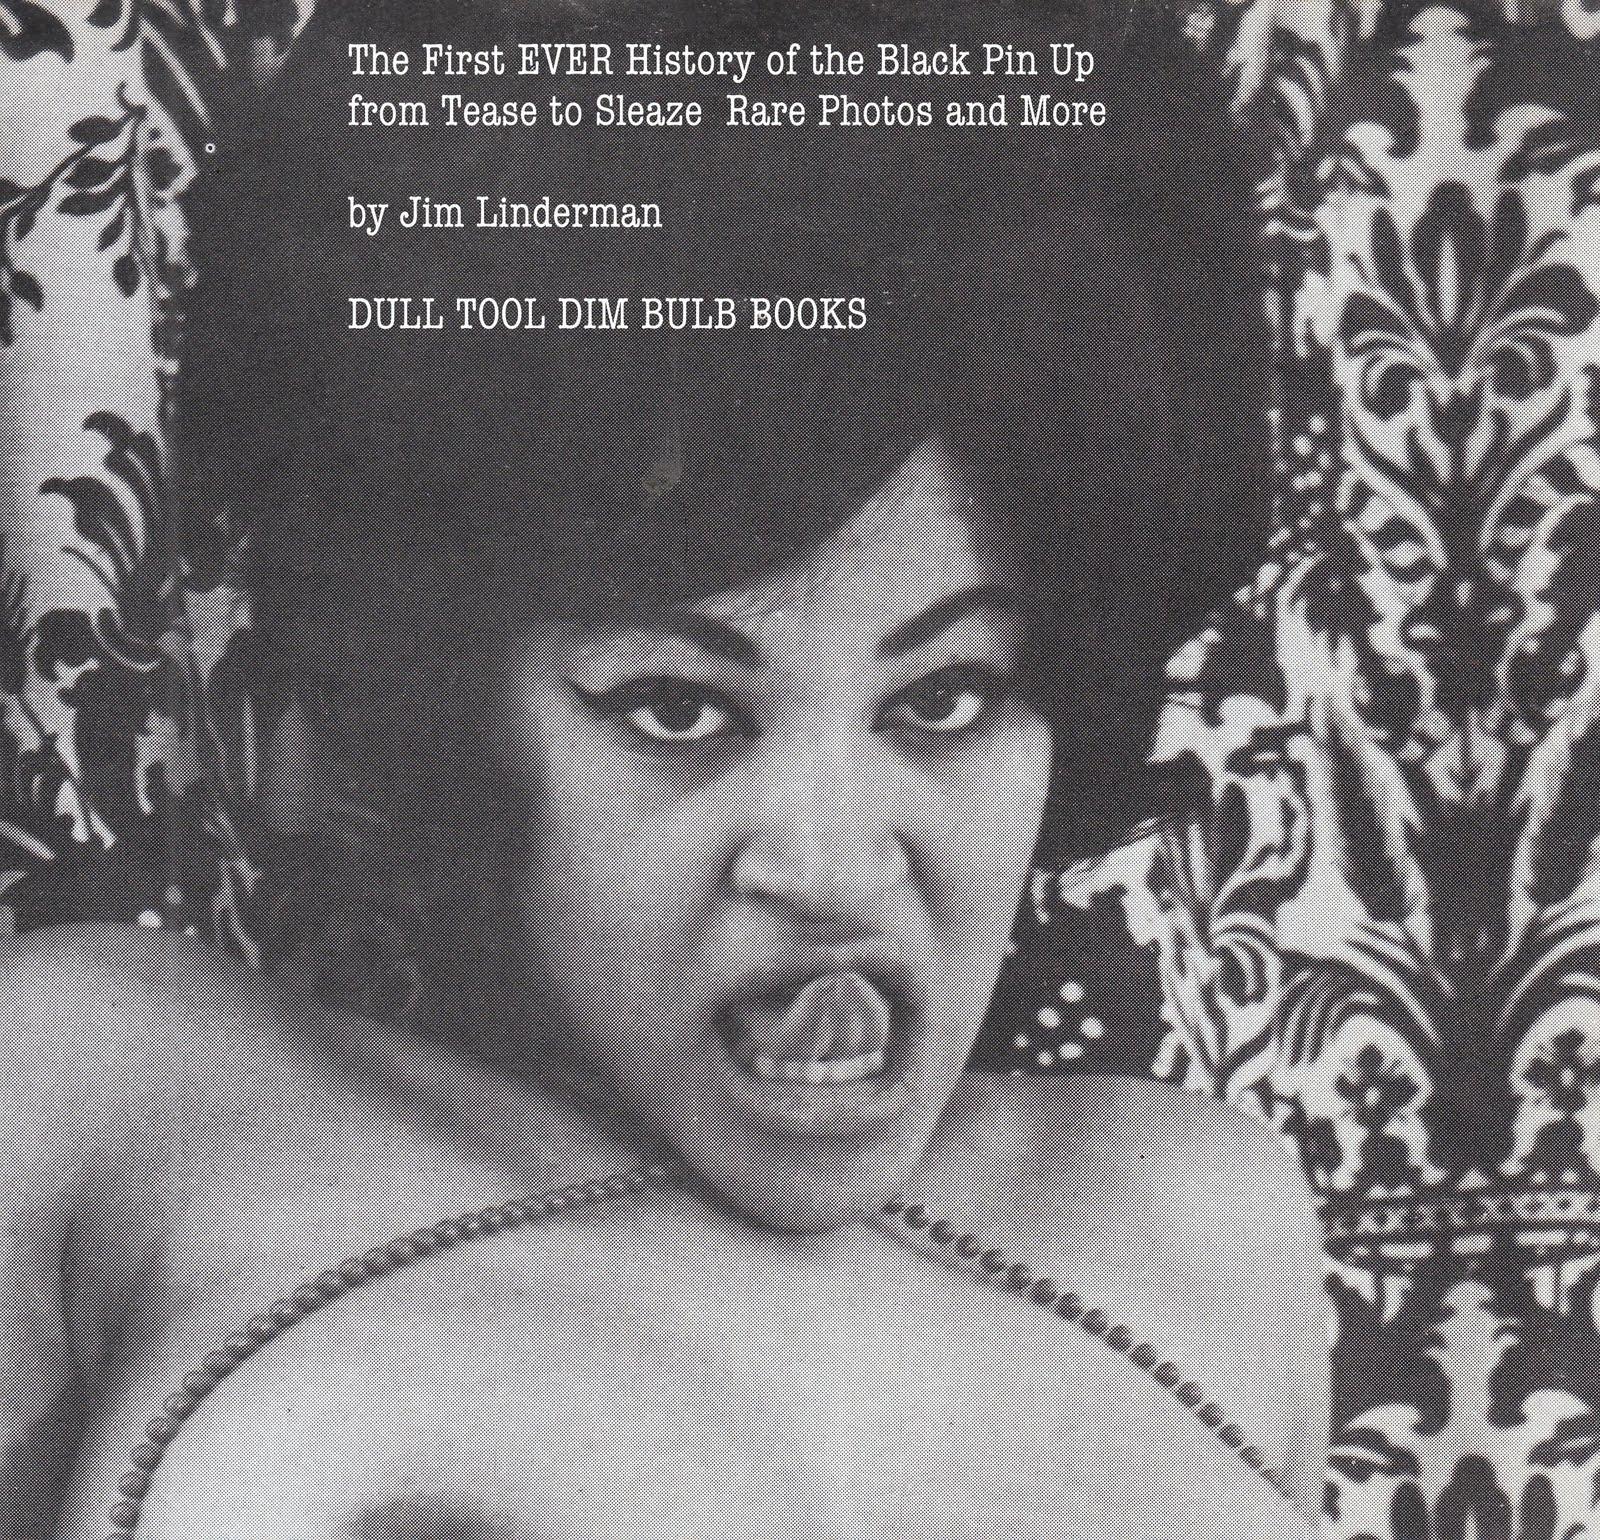 RARE! VINTAGE SLEAZE DIGEST BOOK SANDY THOMAS TRANSVESTITE TV FICTION CLASSICS 4